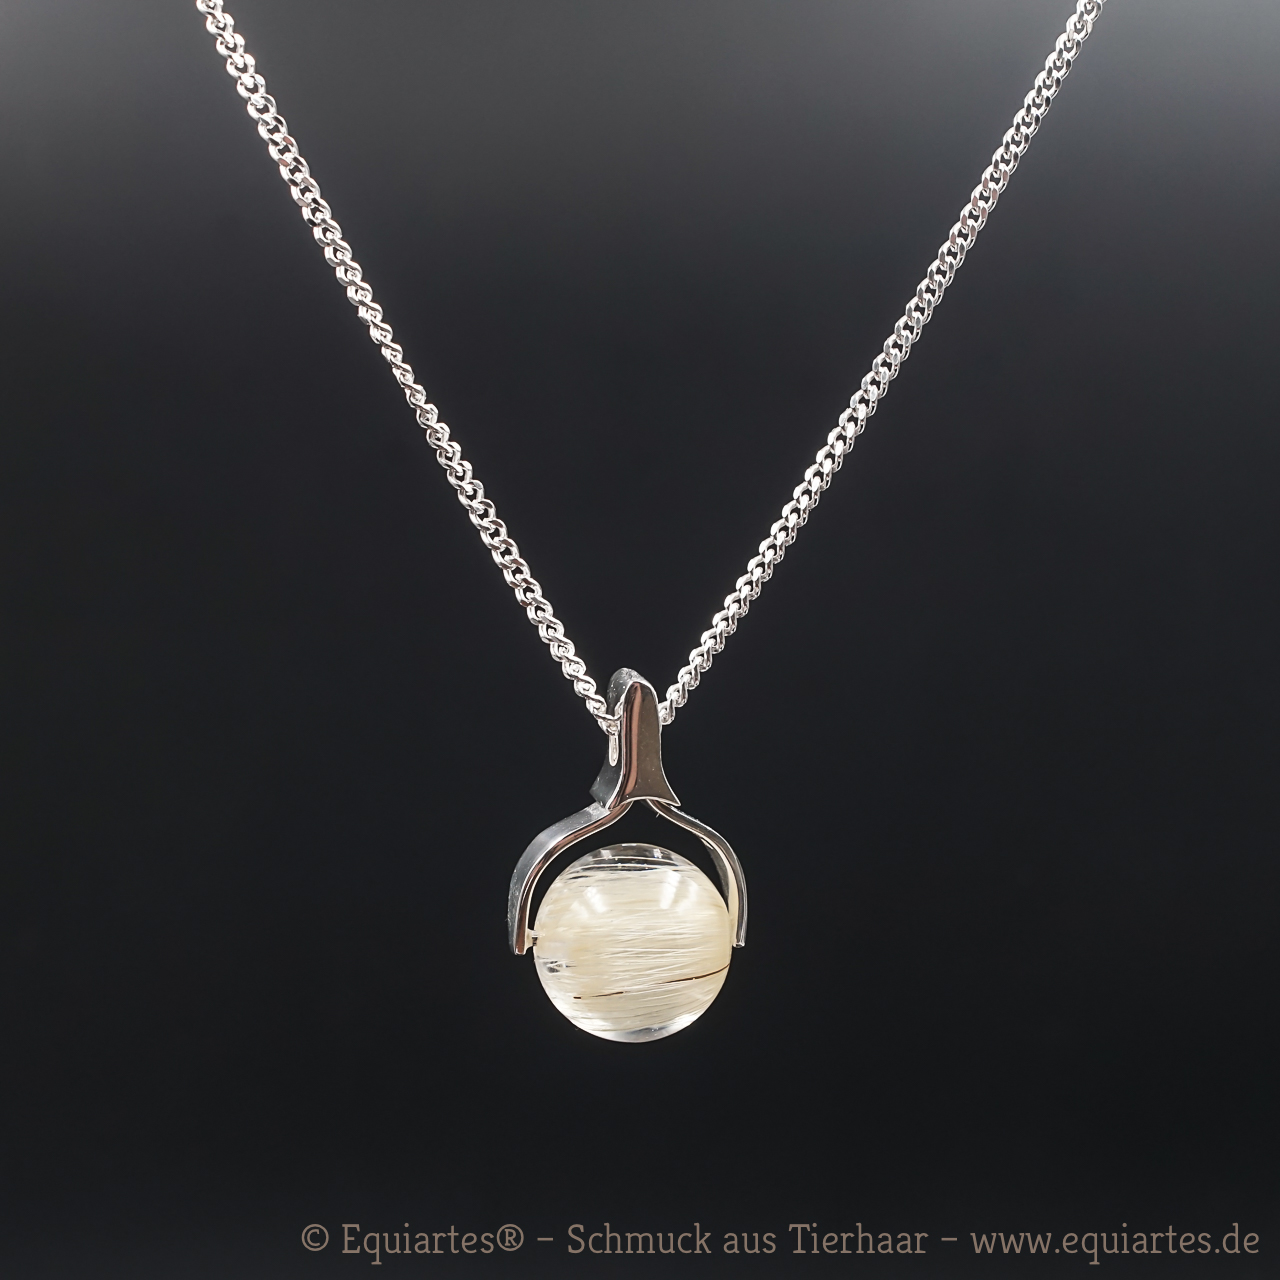 Tierhaarschmuck - Halskette Taurus - Sterlingsilber